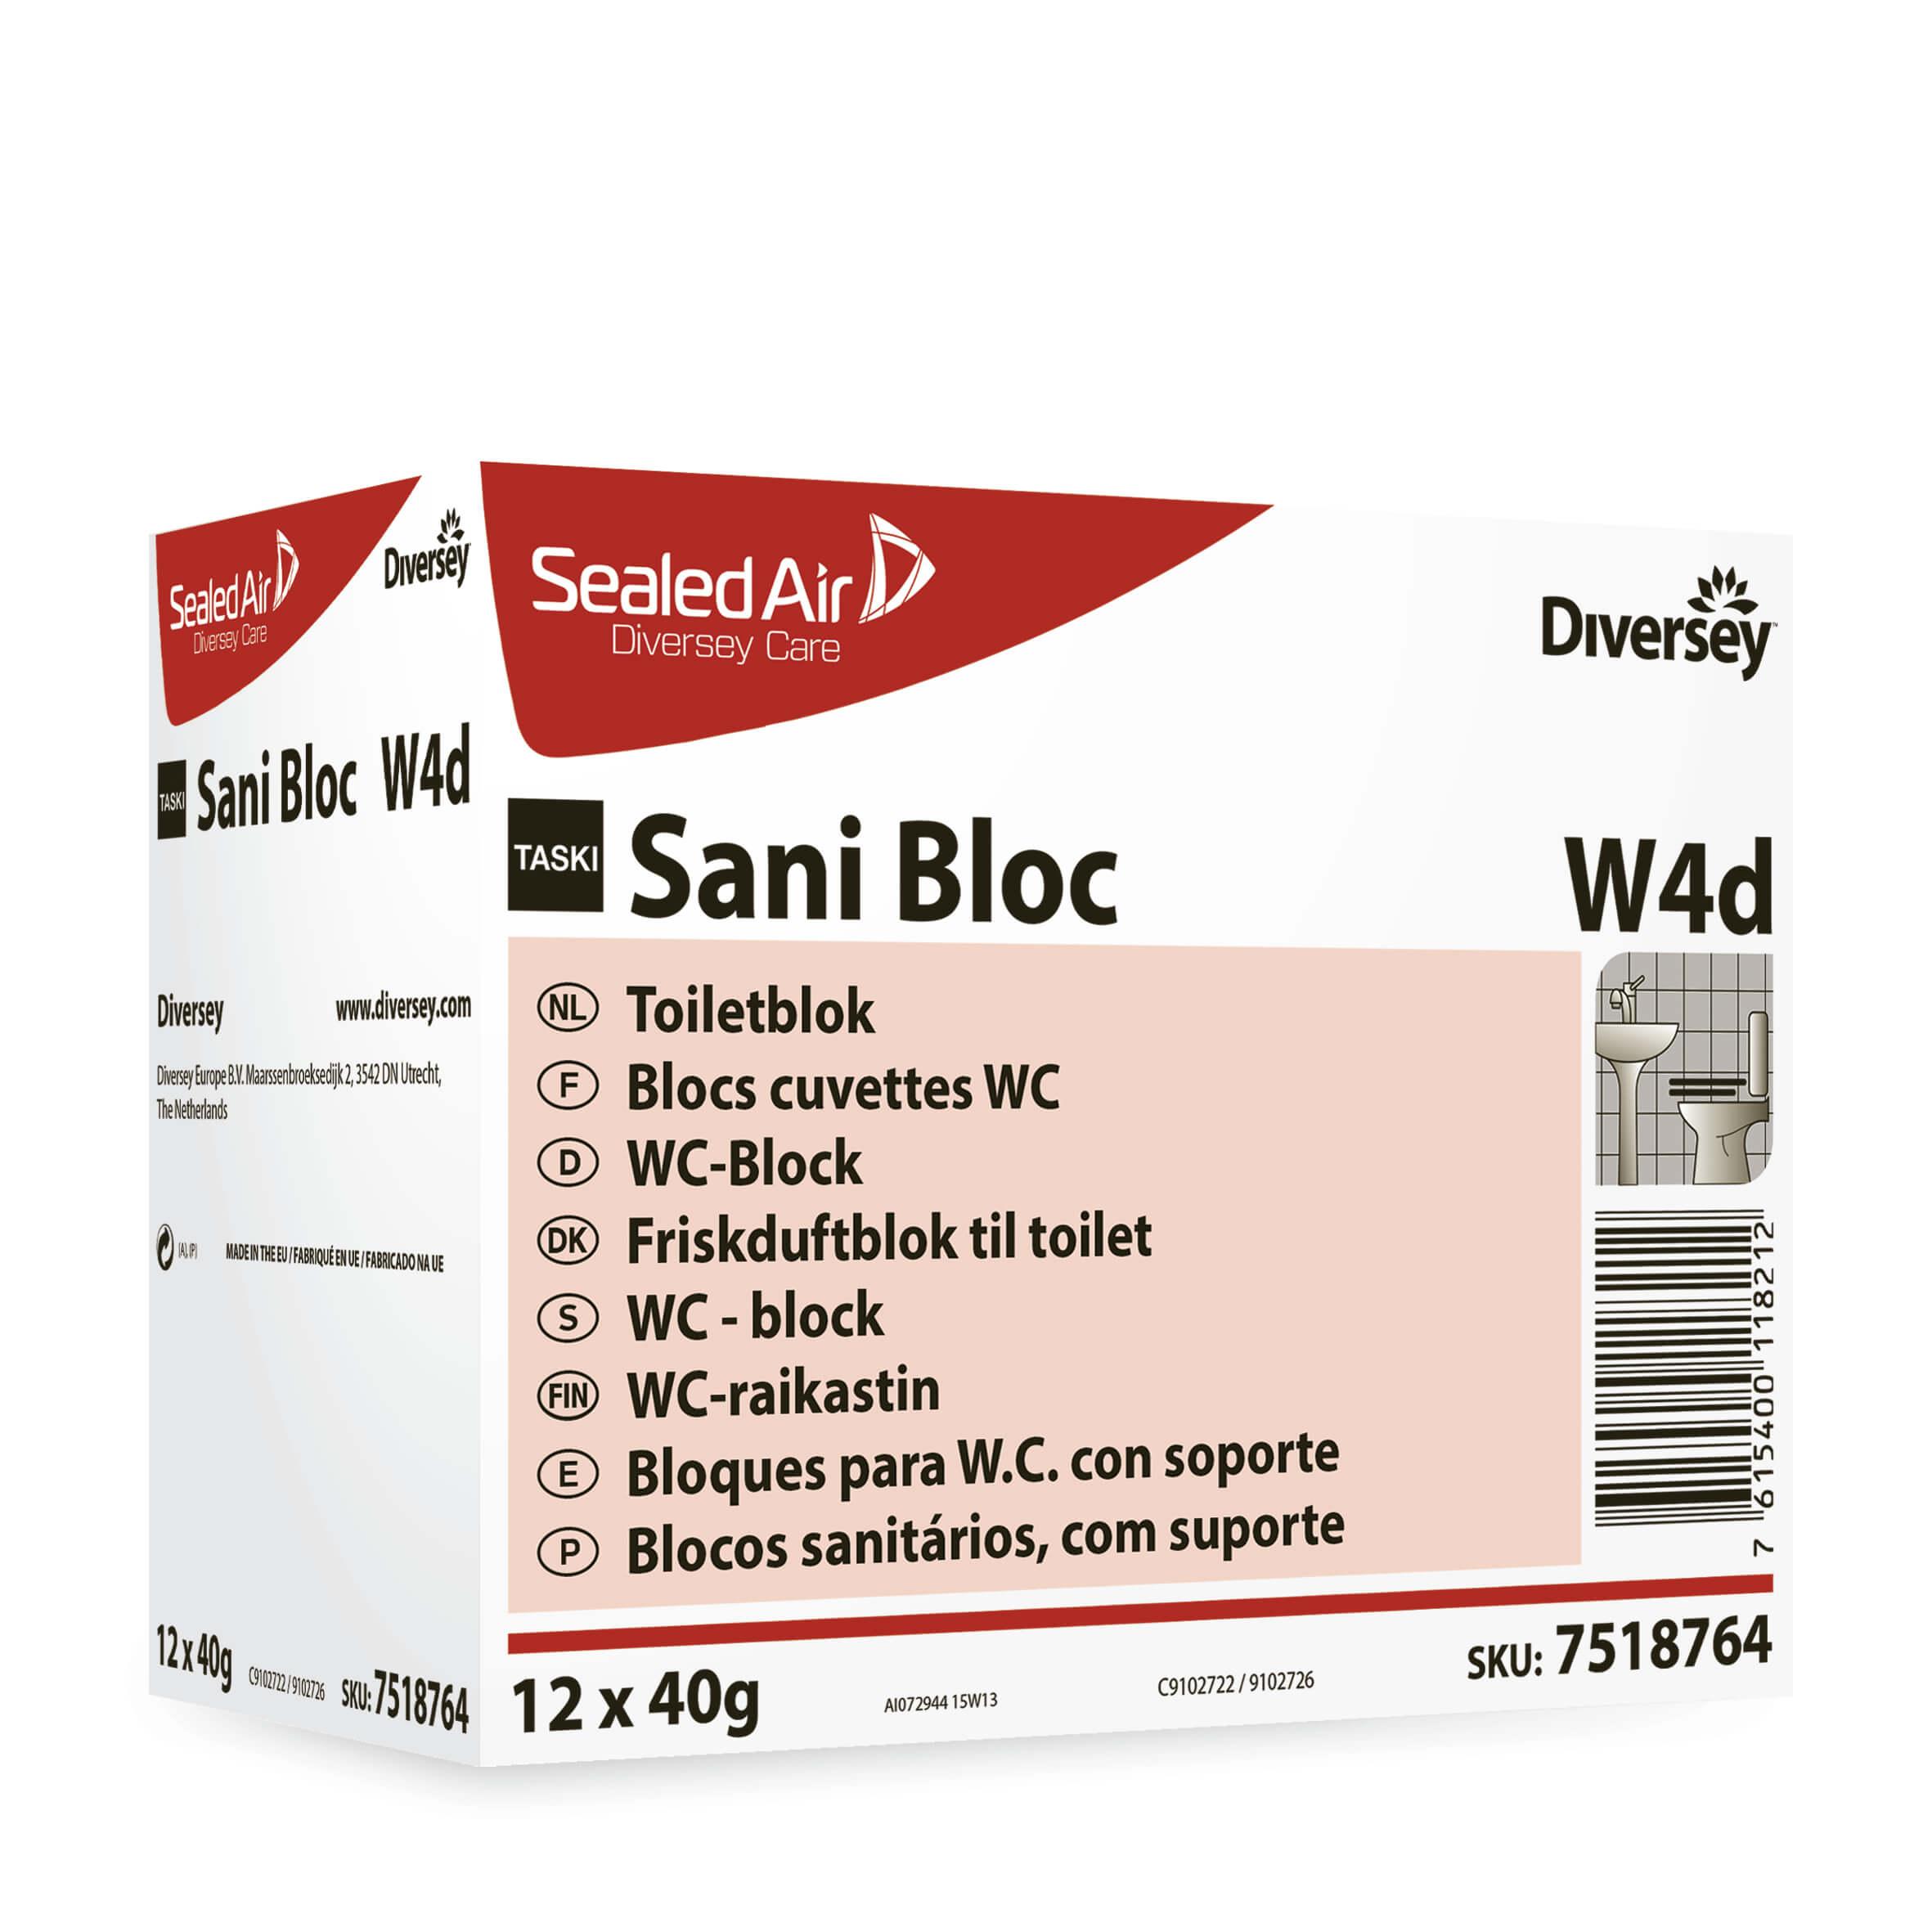 Sani Bloc